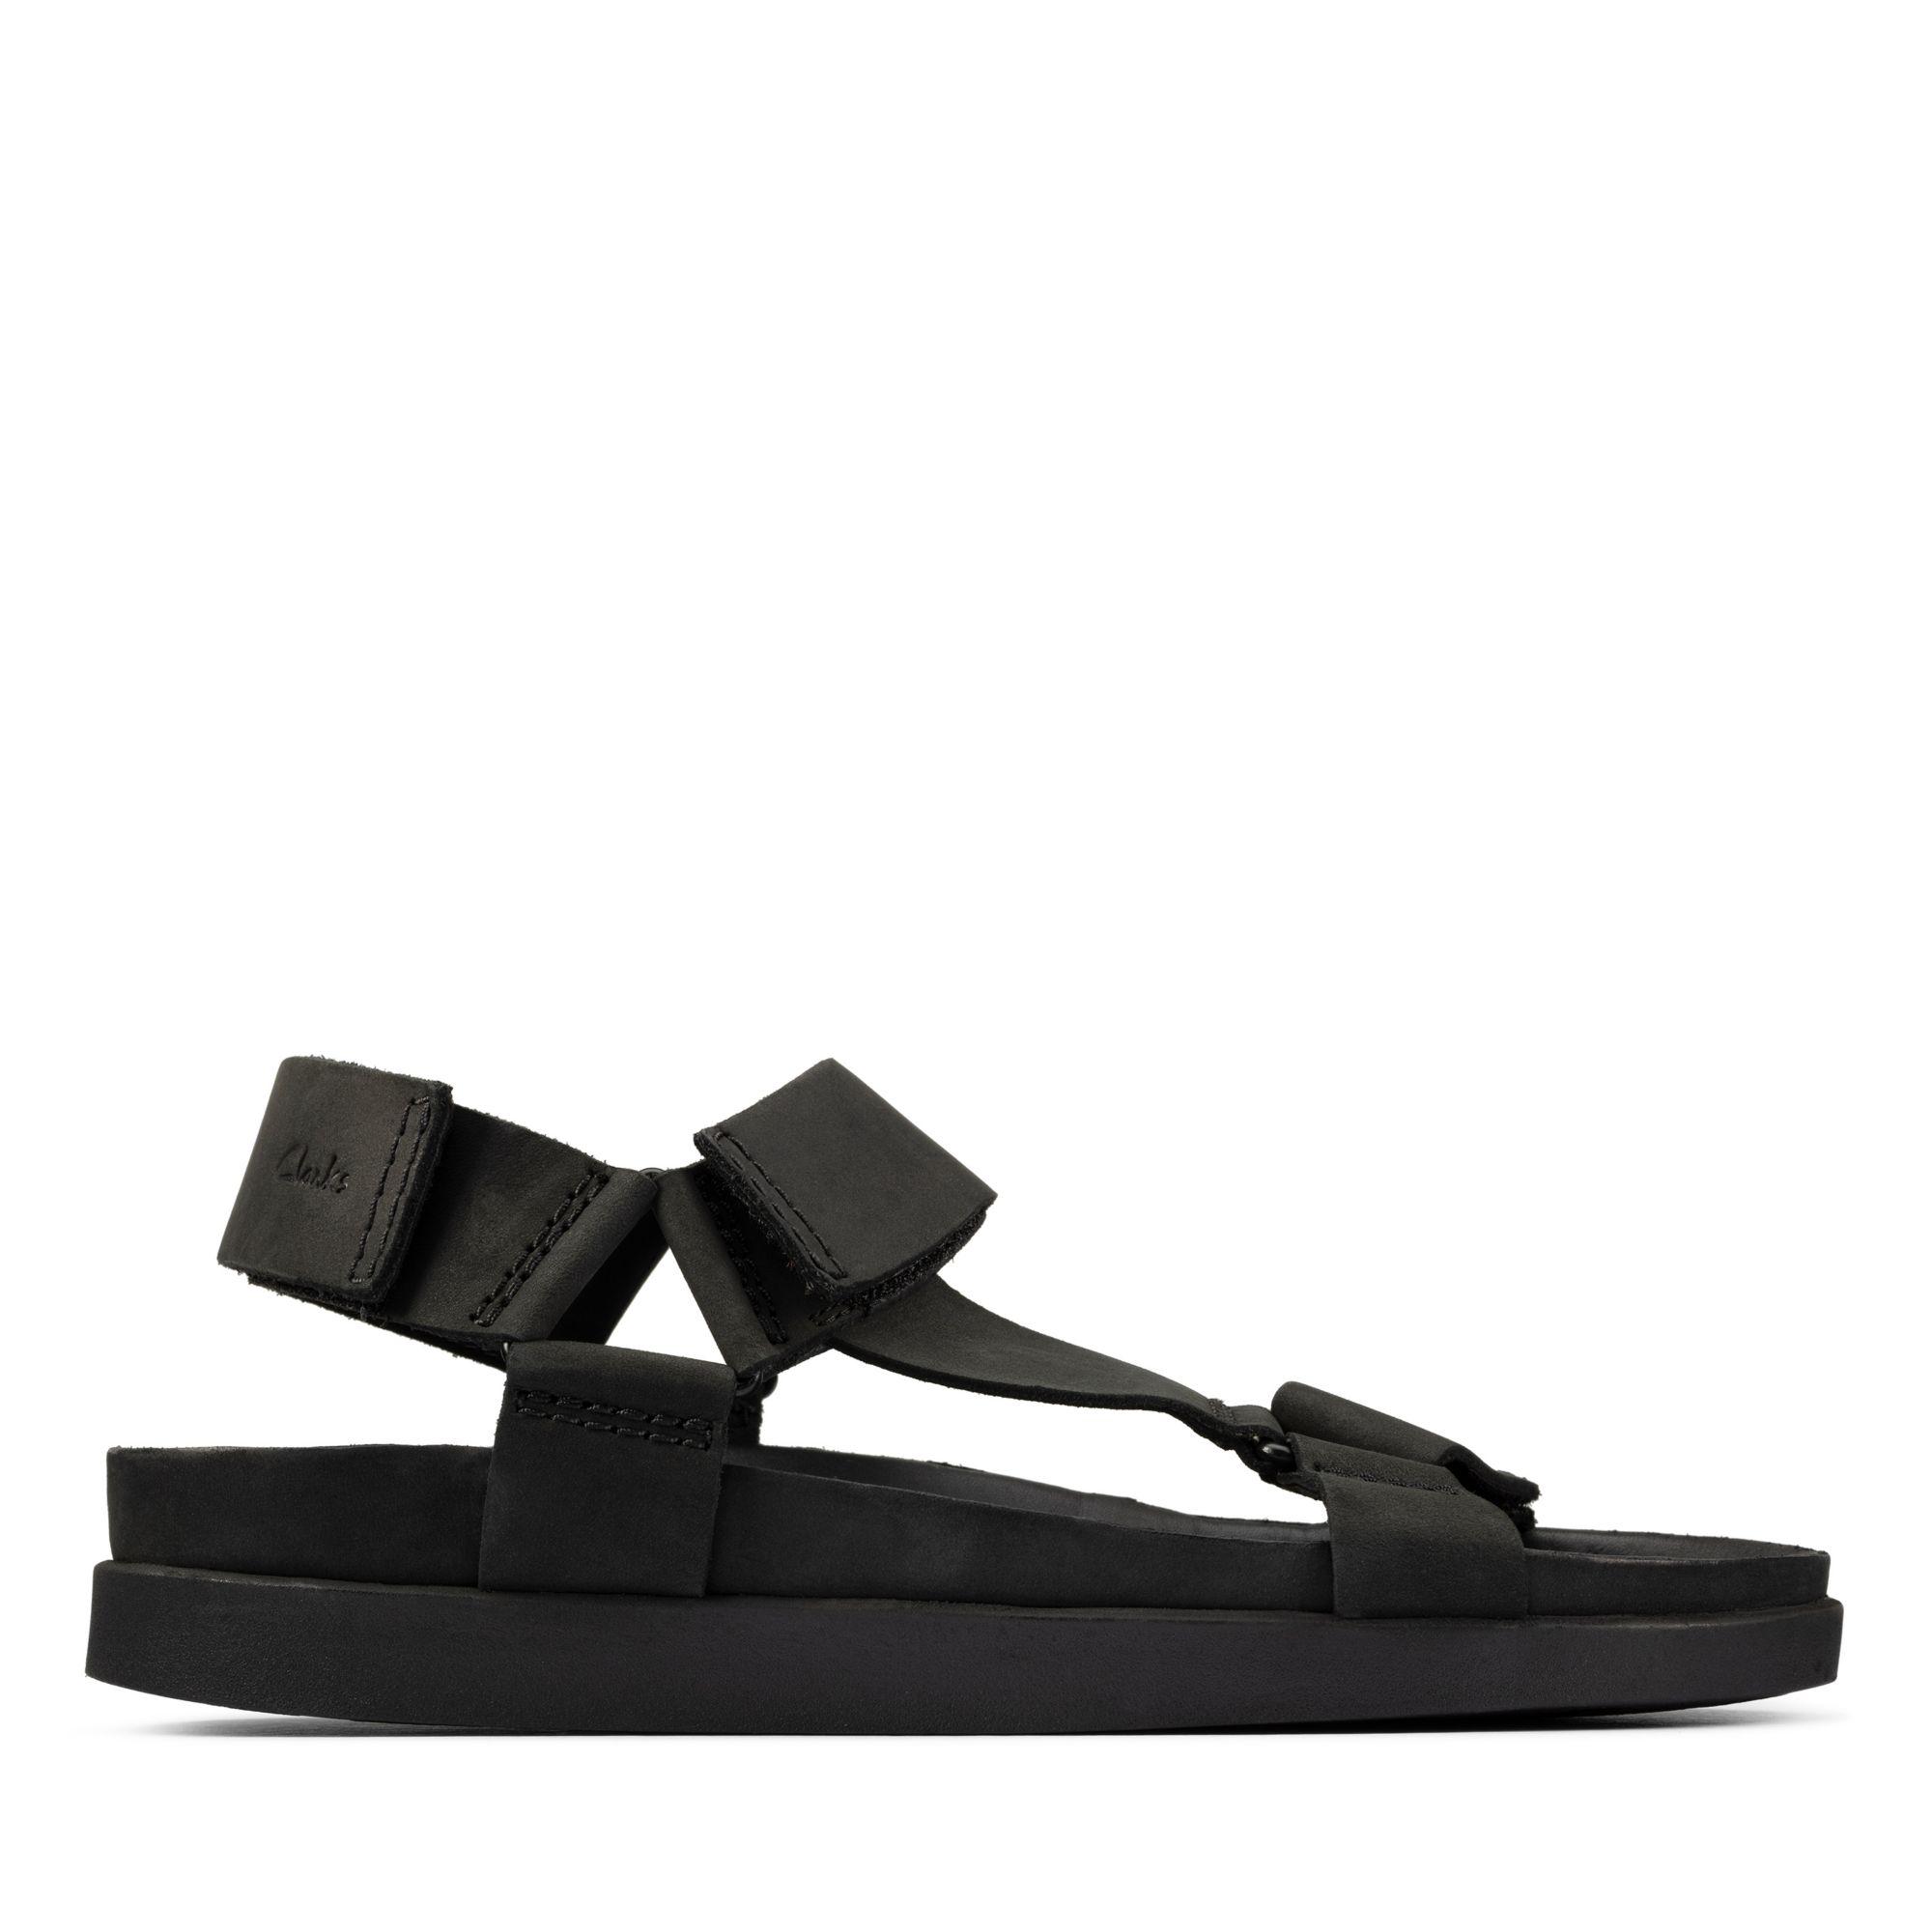 Clarks 夏日街頭-Sunder Range 輕量型運動風摩鬼氈設計涼鞋(黑色)